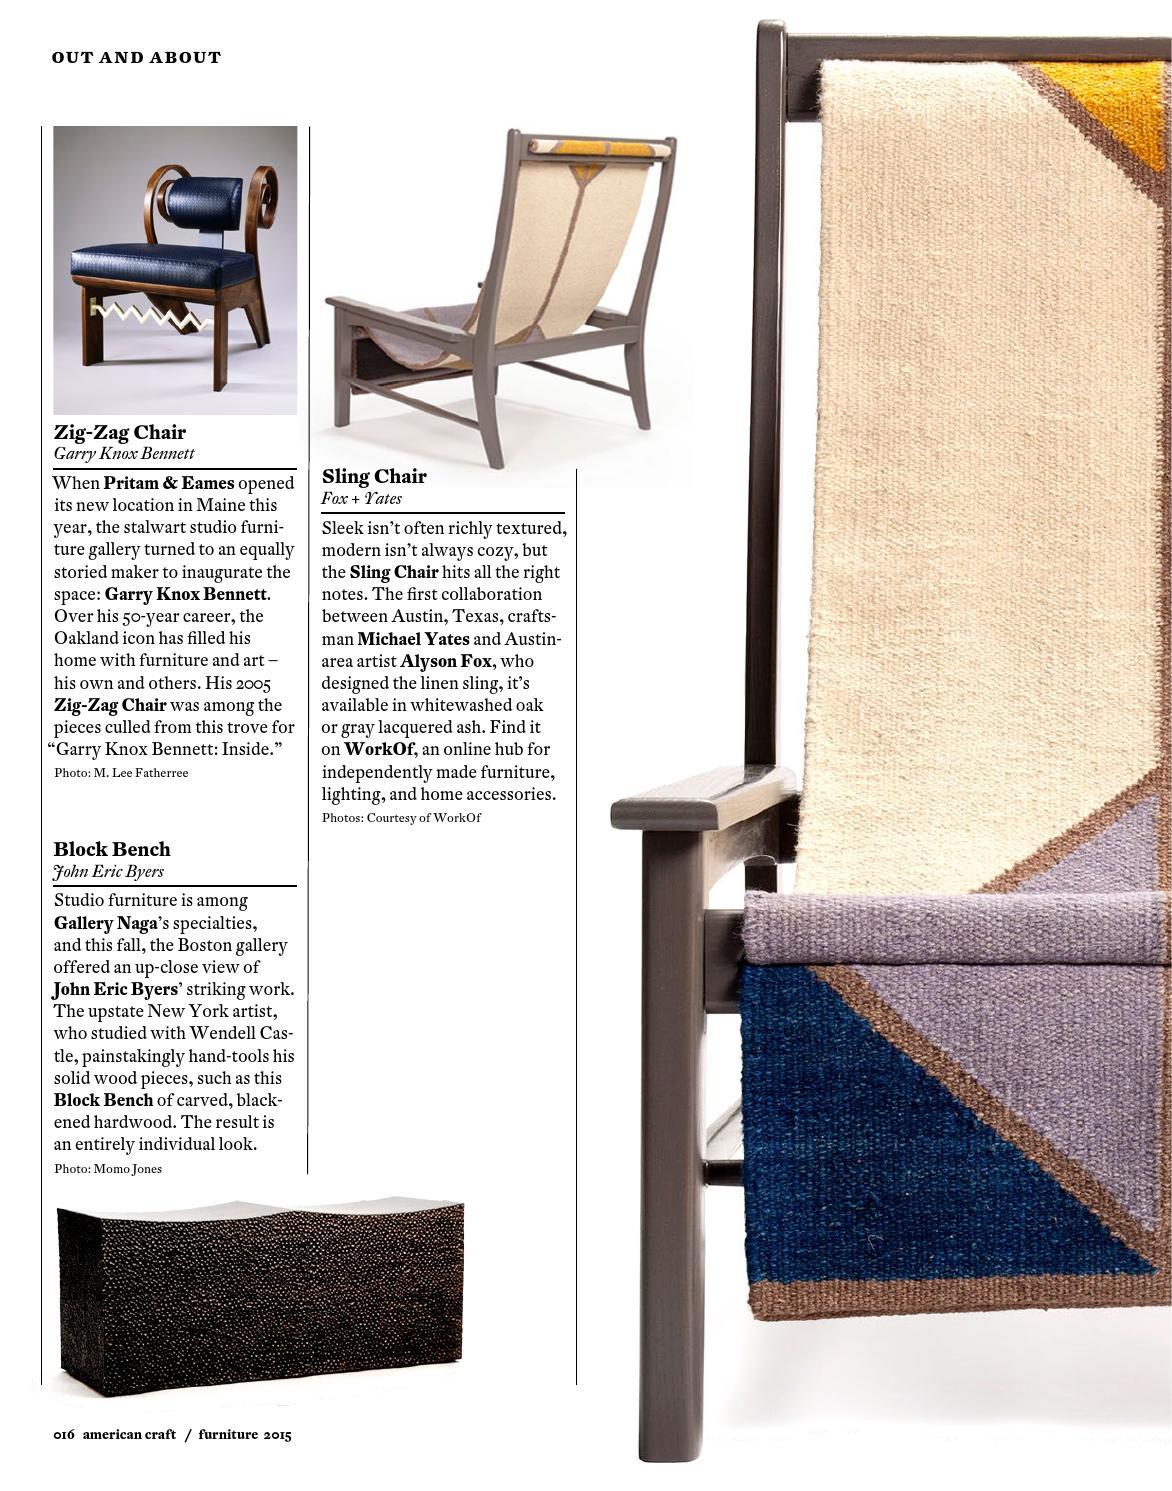 American Craft 2015 Digital Bonus: The Furniture Issue By American Craft  Council   Issuu